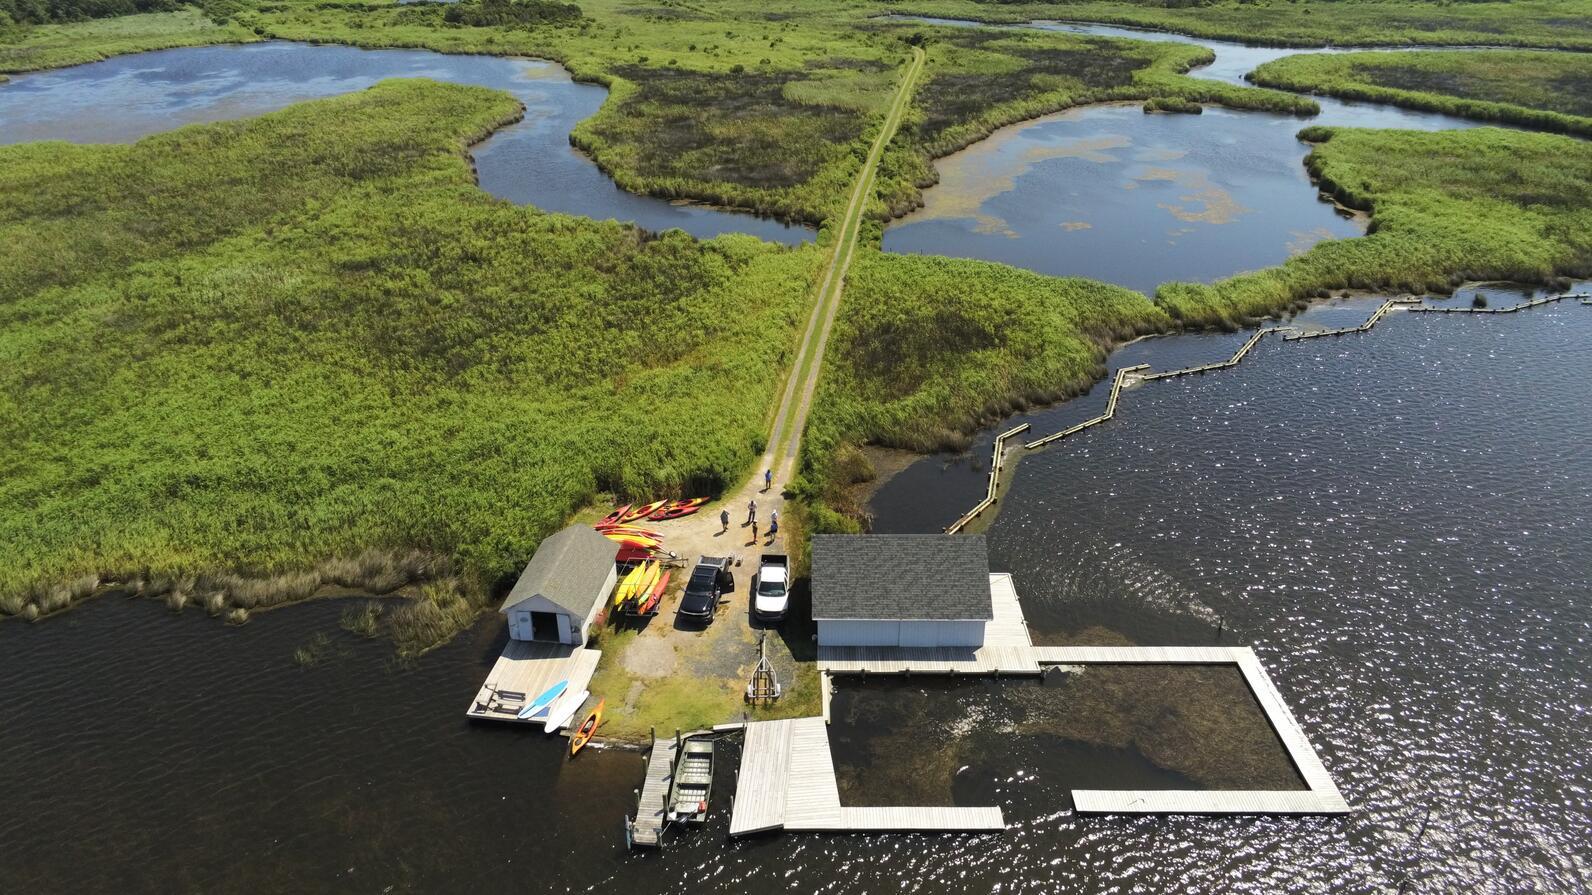 Drone team takes Pine Island footage.